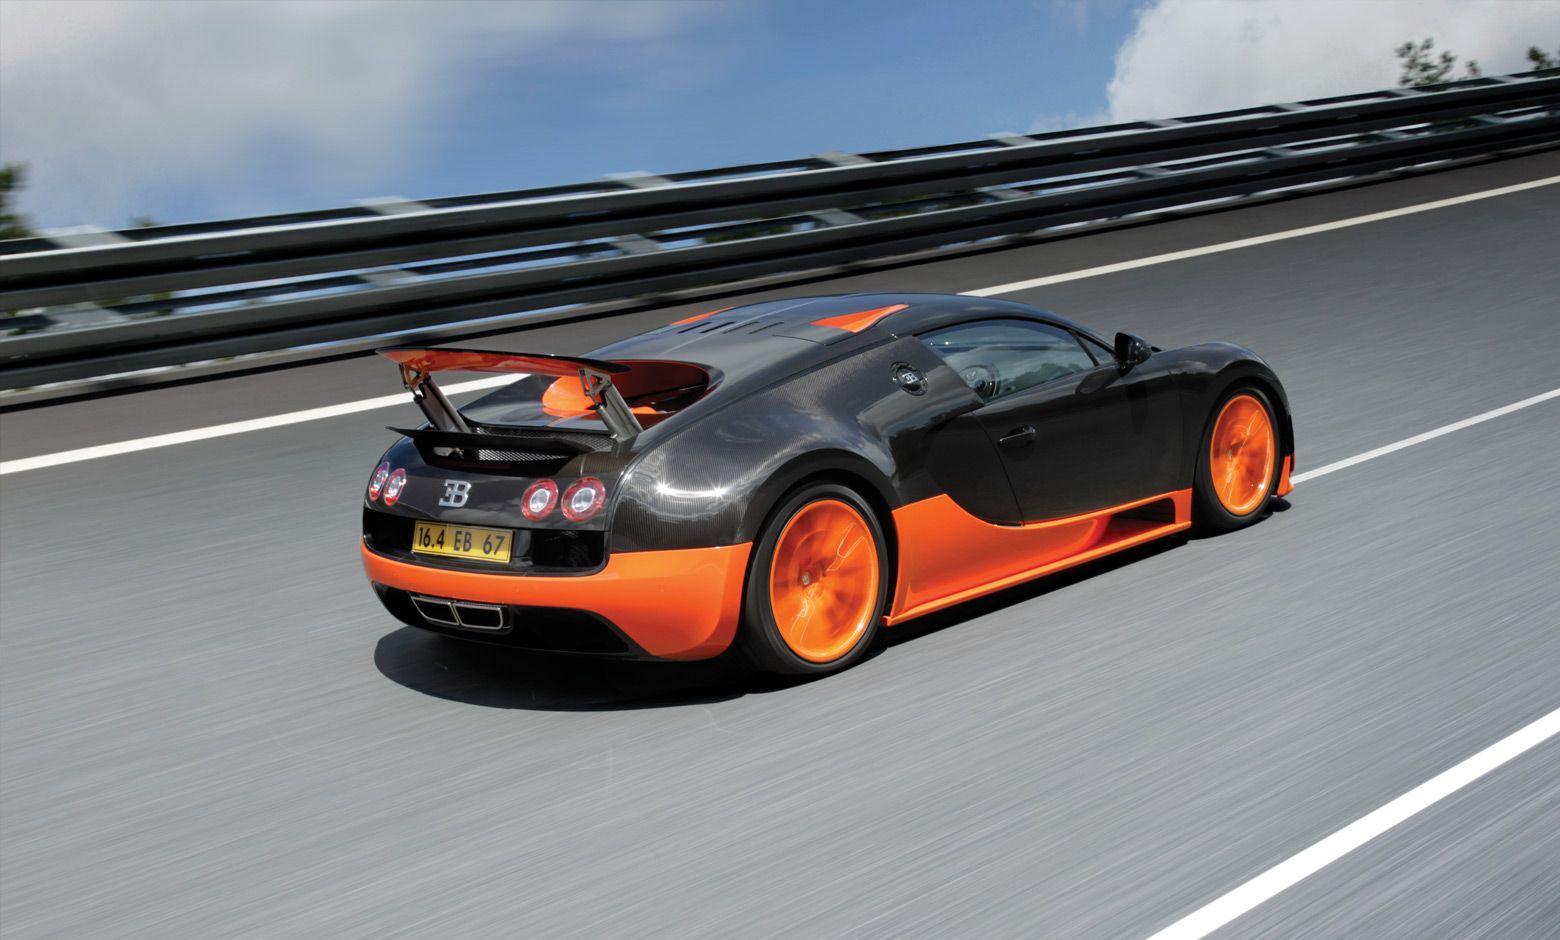 Sports Cars HD Wallpapers - Top Free Sports Cars HD